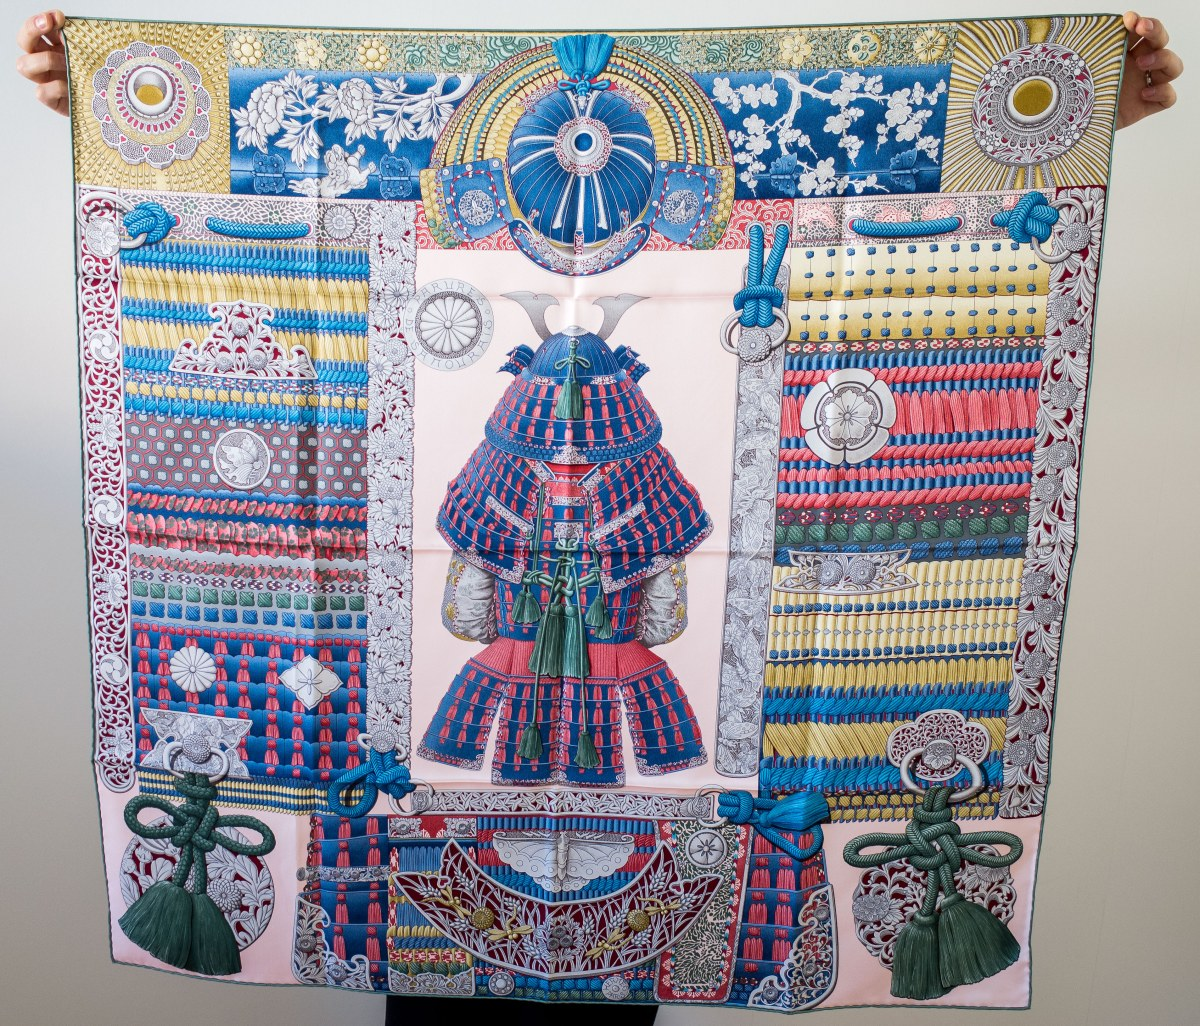 Parures de Samouiras, Aline Honore, Hermes scarf, carre, knot, knotting, tutorial, hermes carre, Hermes Schal, эрмес, платок, карре, как красиво завязать платок, how to wear a scarf, Clic H bleu cielo, Clic H bracelet, Hermes Bl